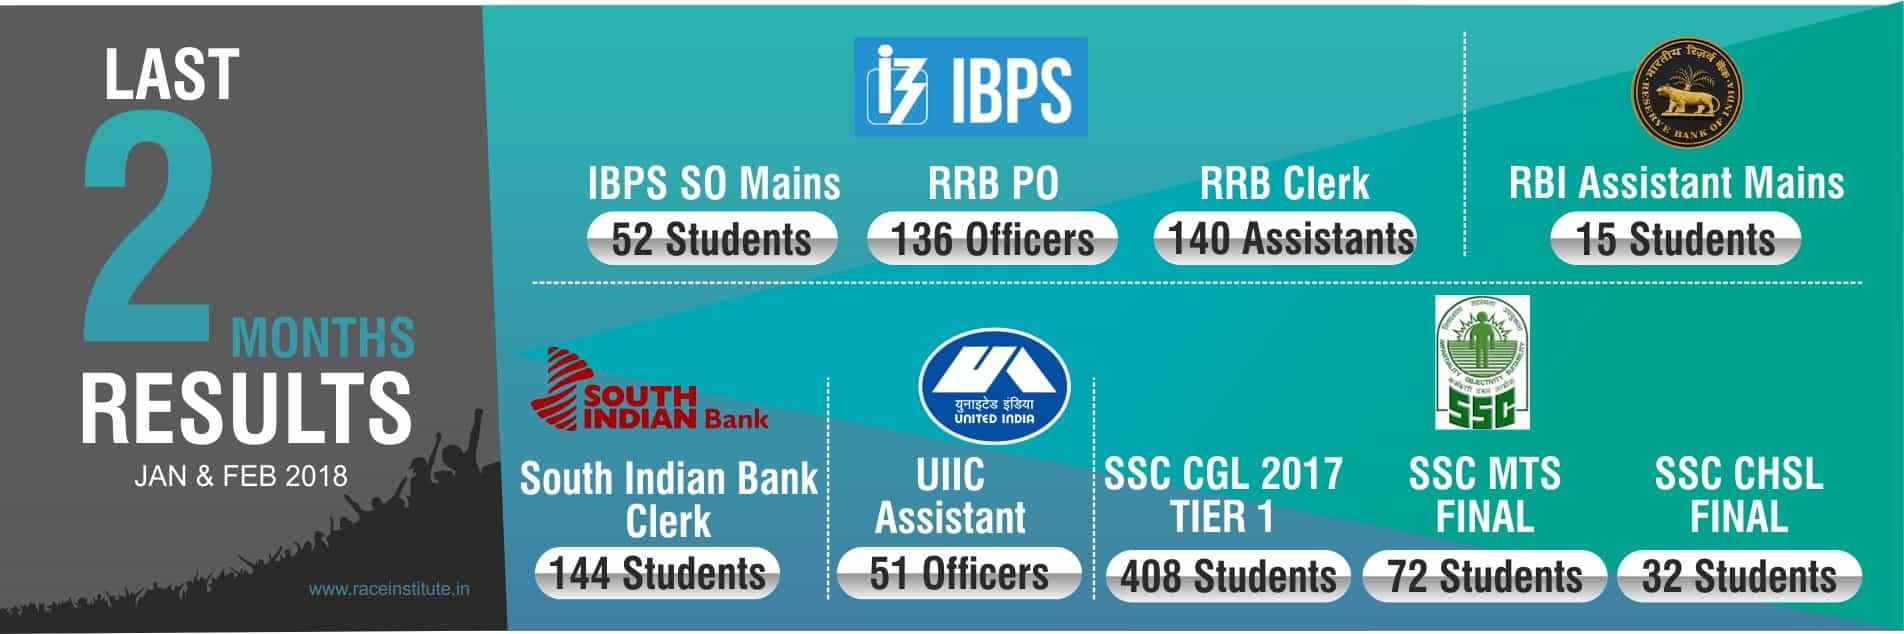 BEST BANK SSC TNPSC EXAM COACHING CLASSES IN VELLOREBEST BANK SSC TNPSC EXAM COACHING CLASSES IN VELLORE